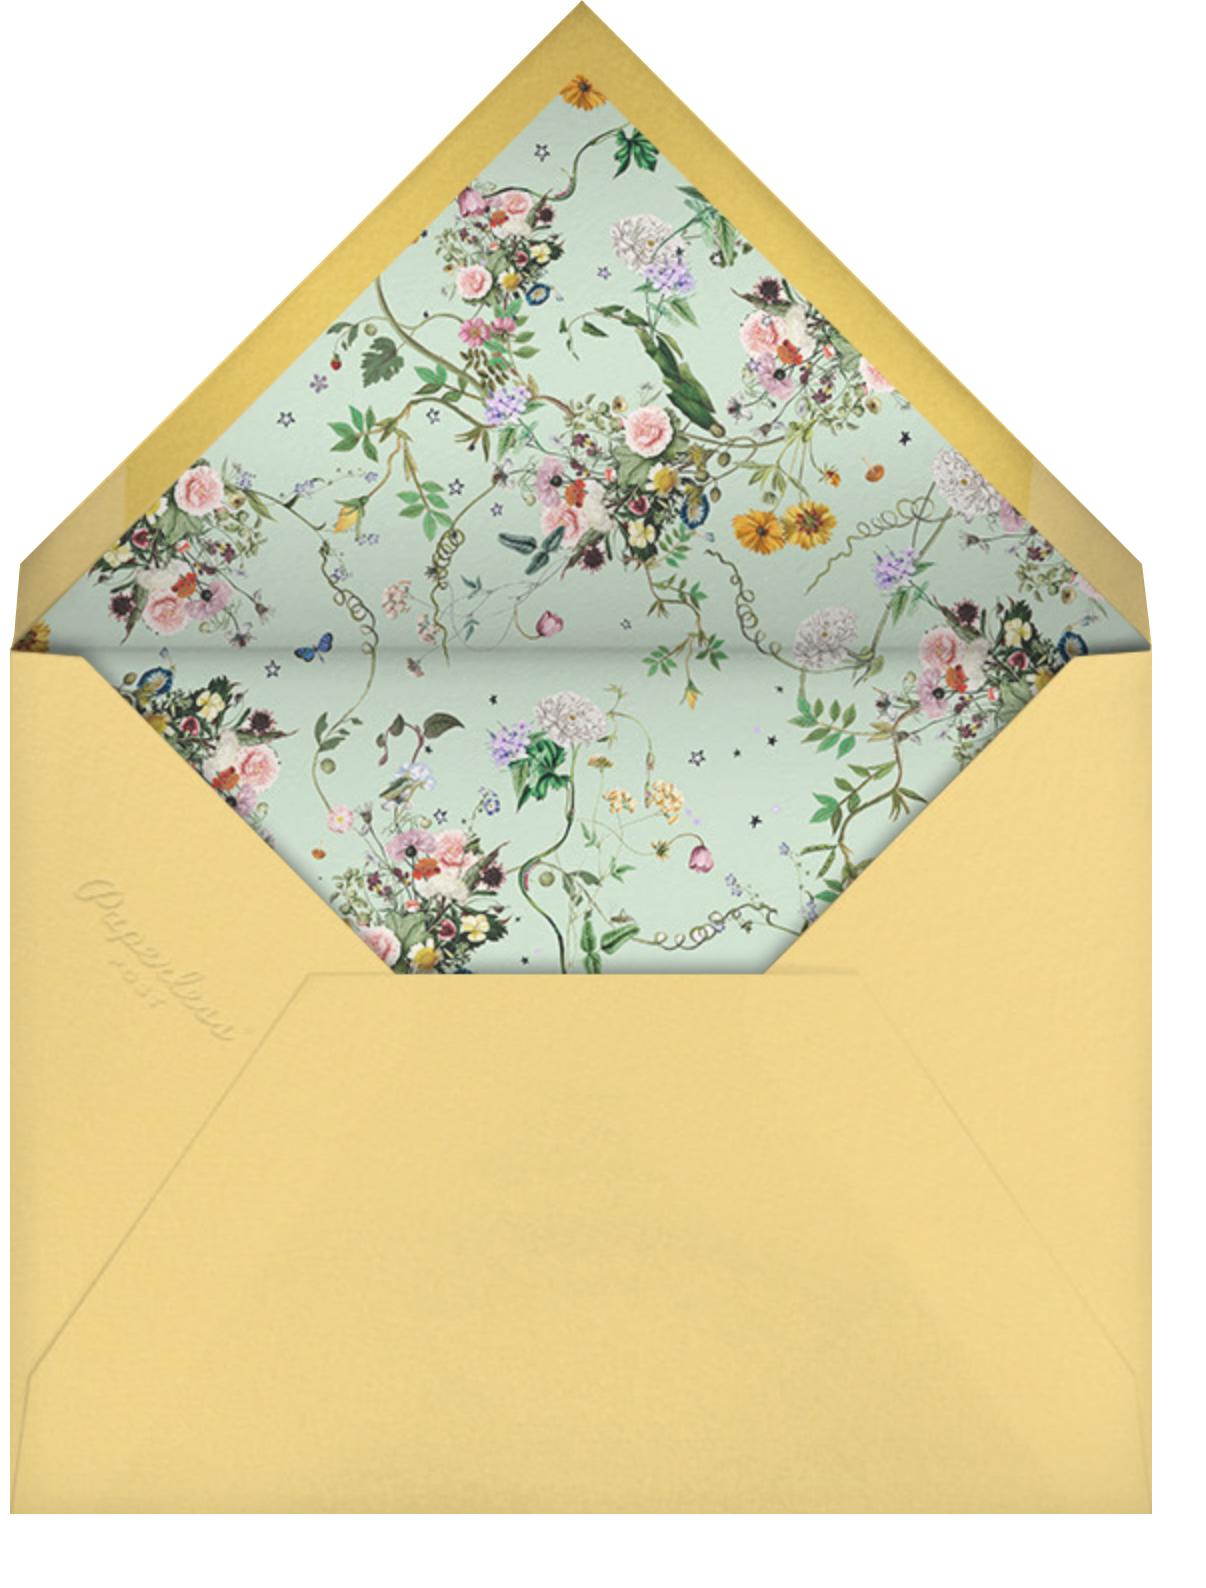 Celestial Flowers - Stephanie Fishwick - Bachelorette party - envelope back